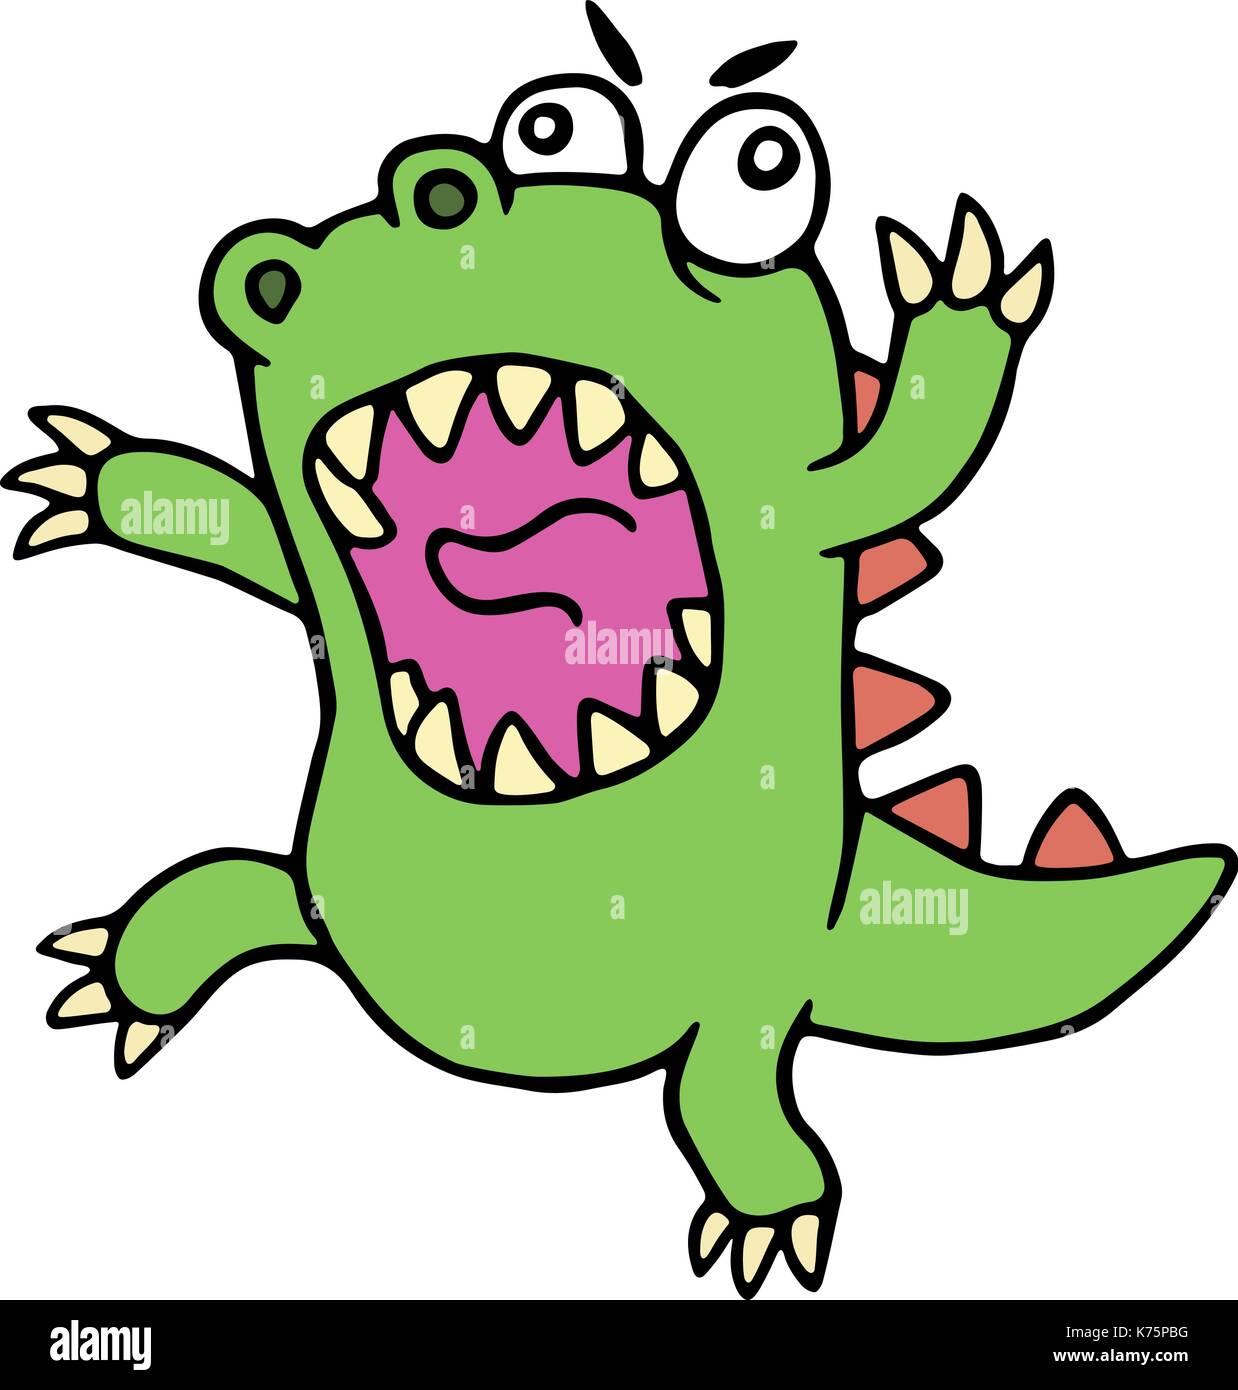 Mad cartoon dinosaur. Vector illustration. Cute imaginary animal character. - Stock Vector